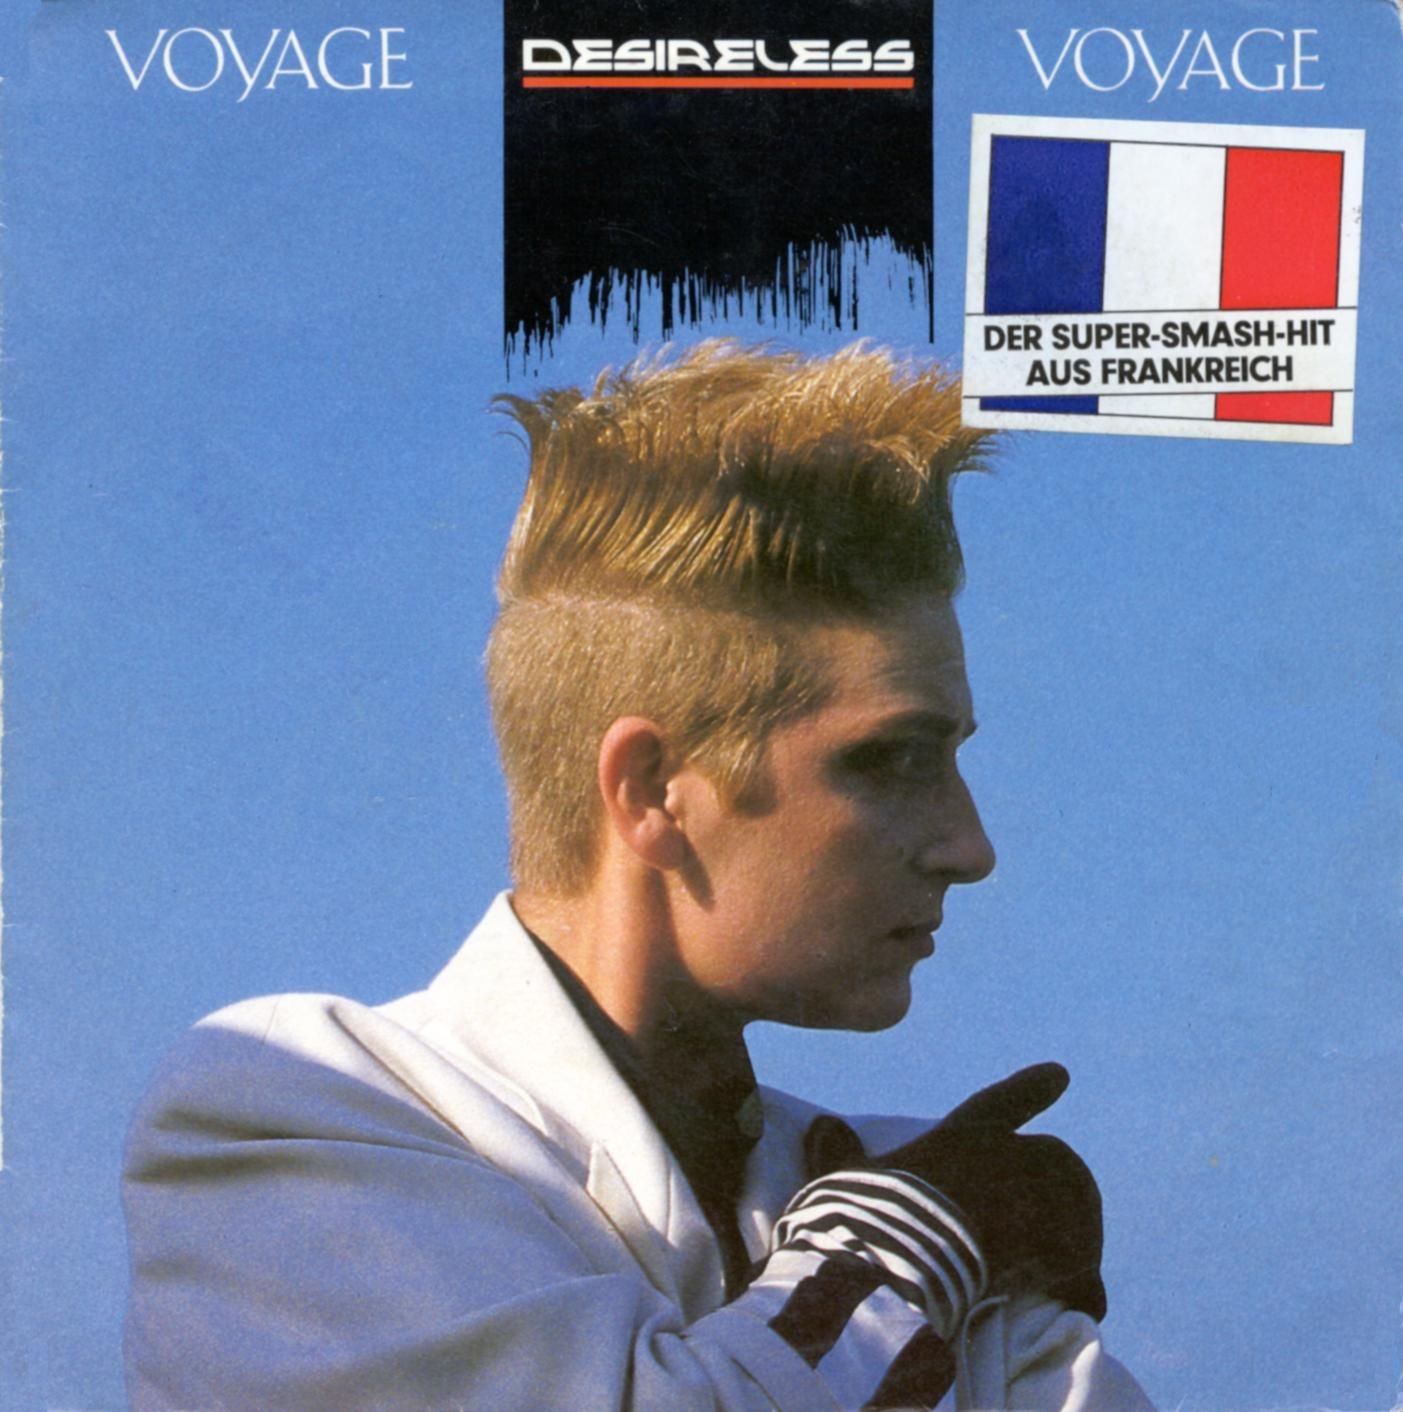 Voyage, voyage (Foto: Desireless)